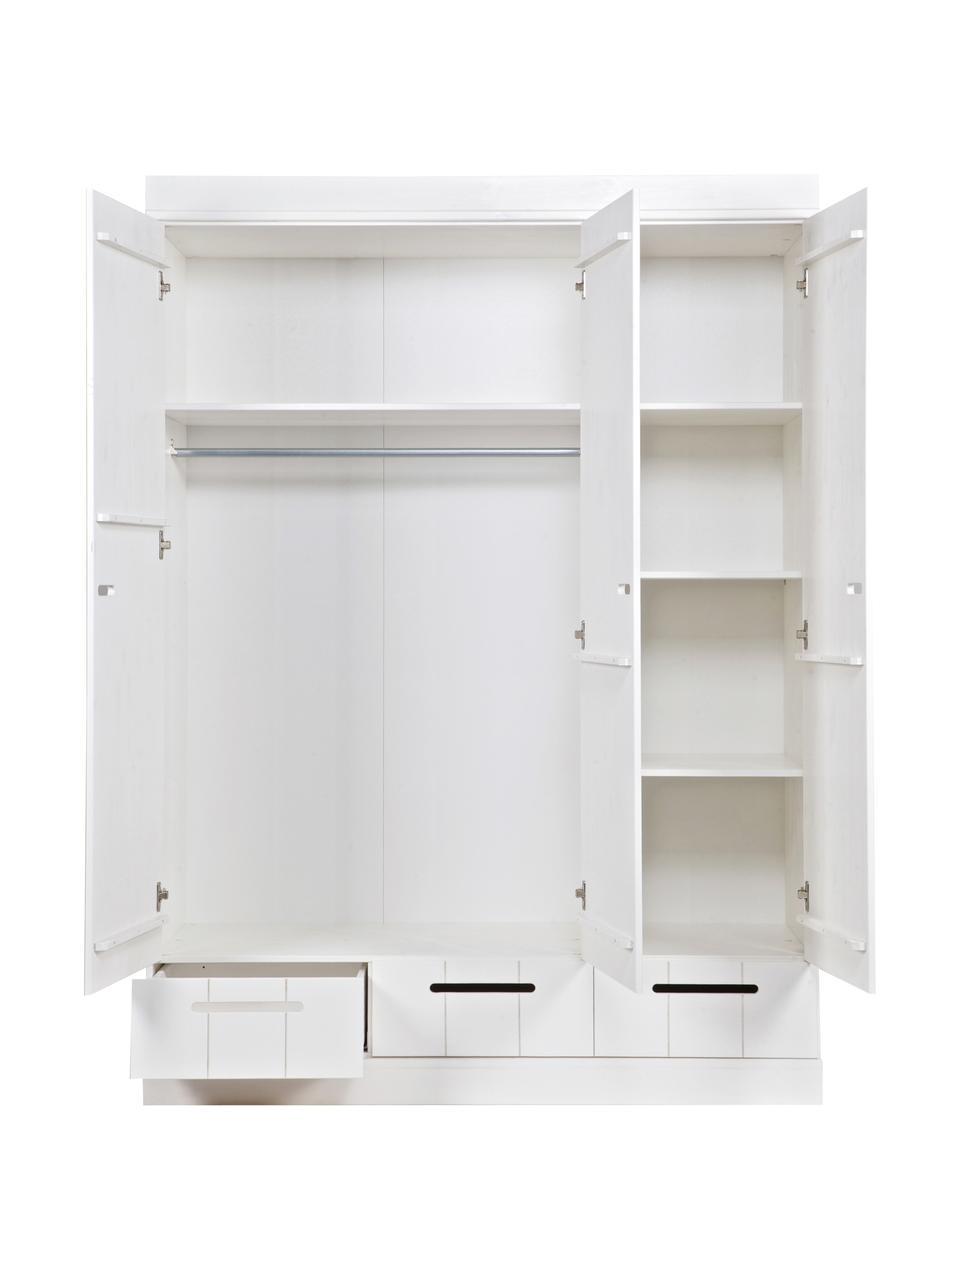 Armoire blanche 3 portes Connect, Blanc